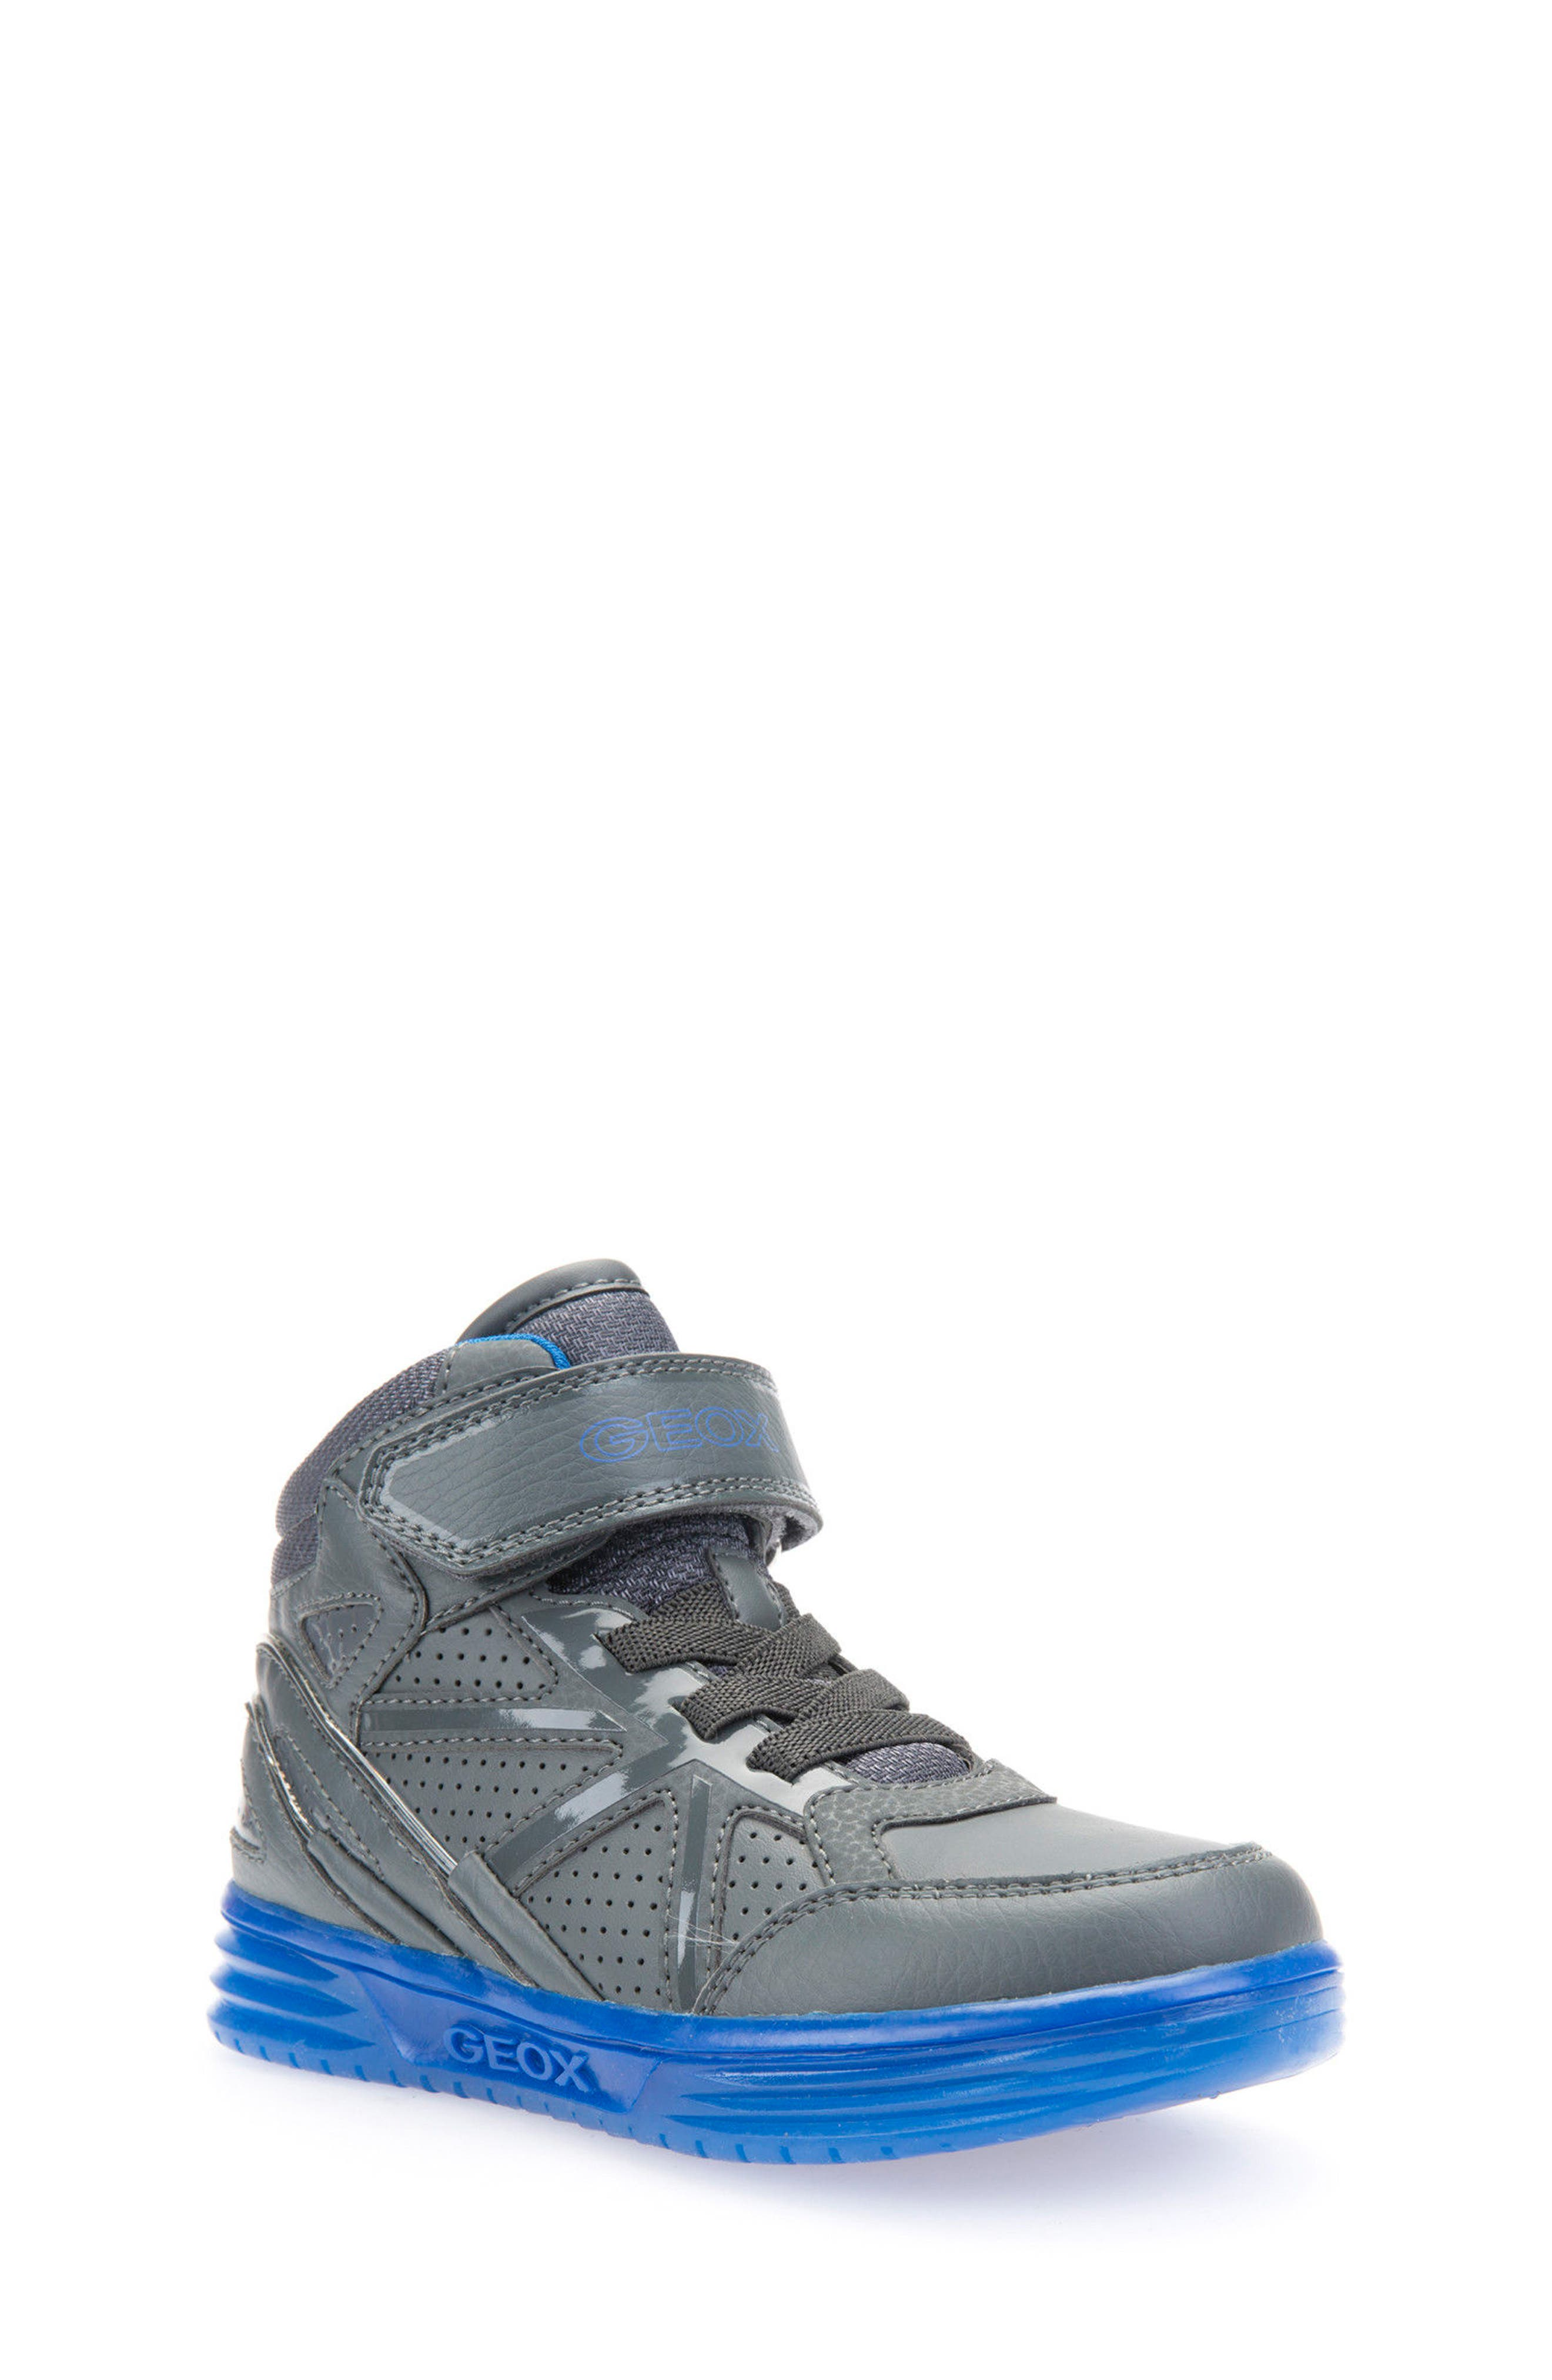 Argonat High Top Sneaker,                             Main thumbnail 1, color,                             Dark Grey/ Royal